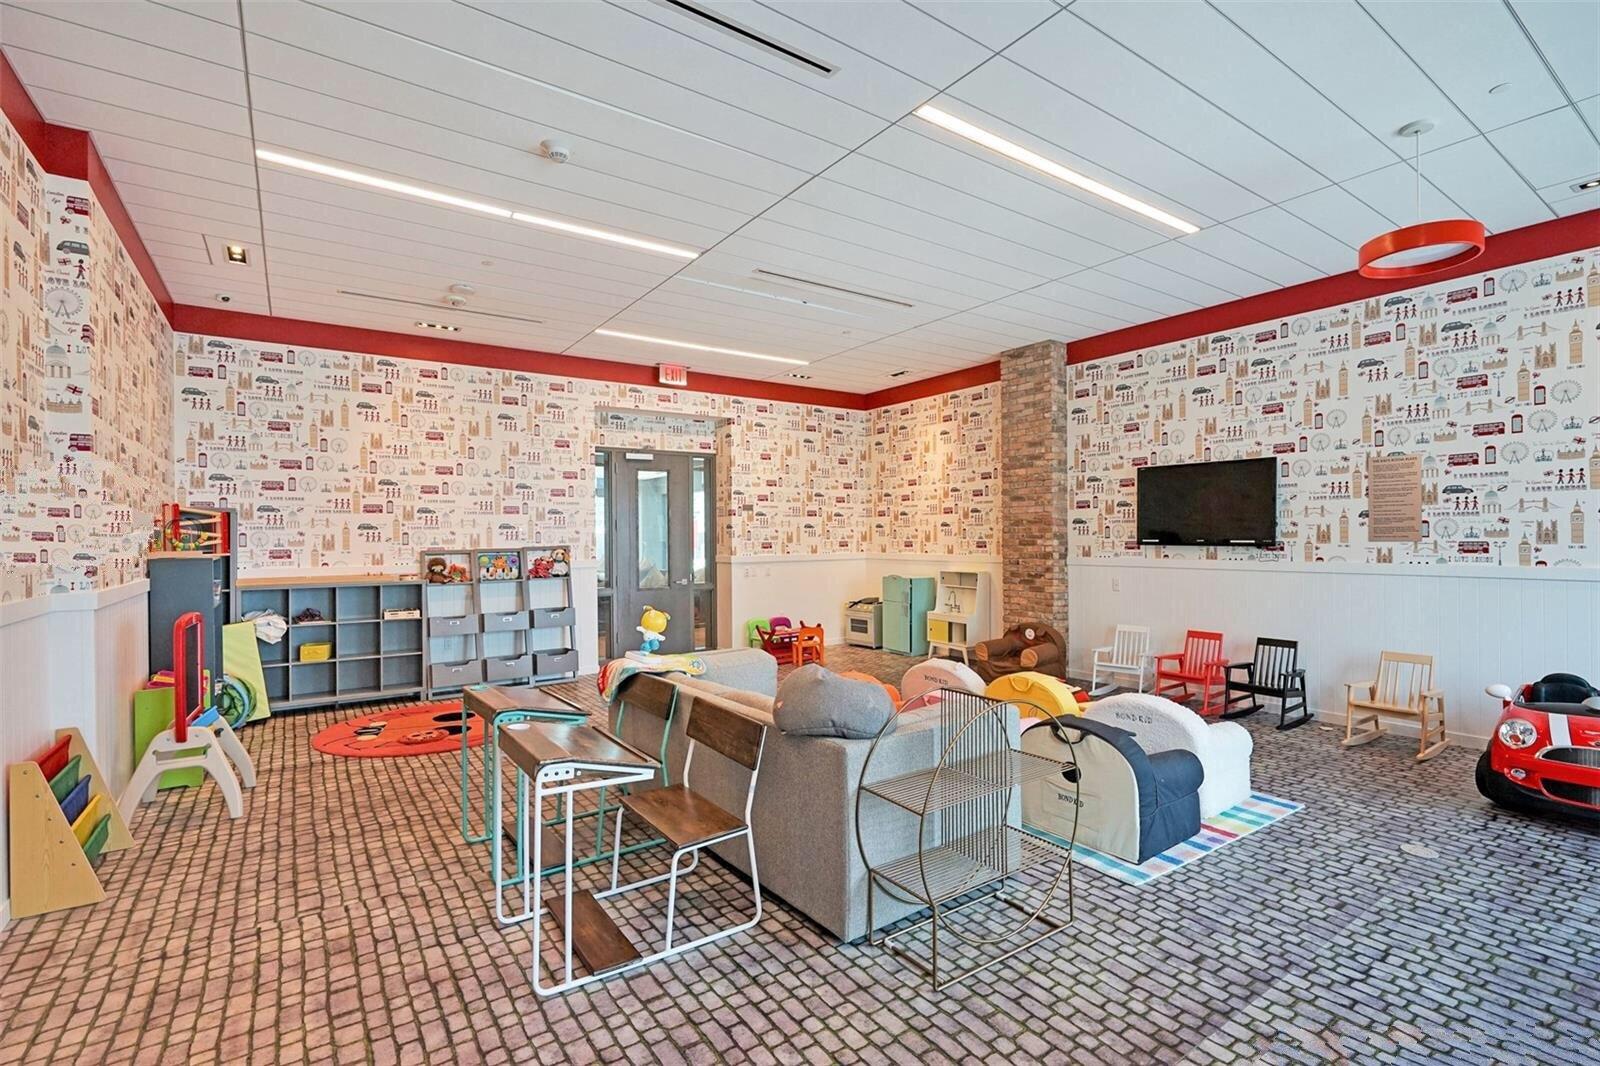 playroom-the-bond-on-brickell_lipstickandchicspaces.com.jpg